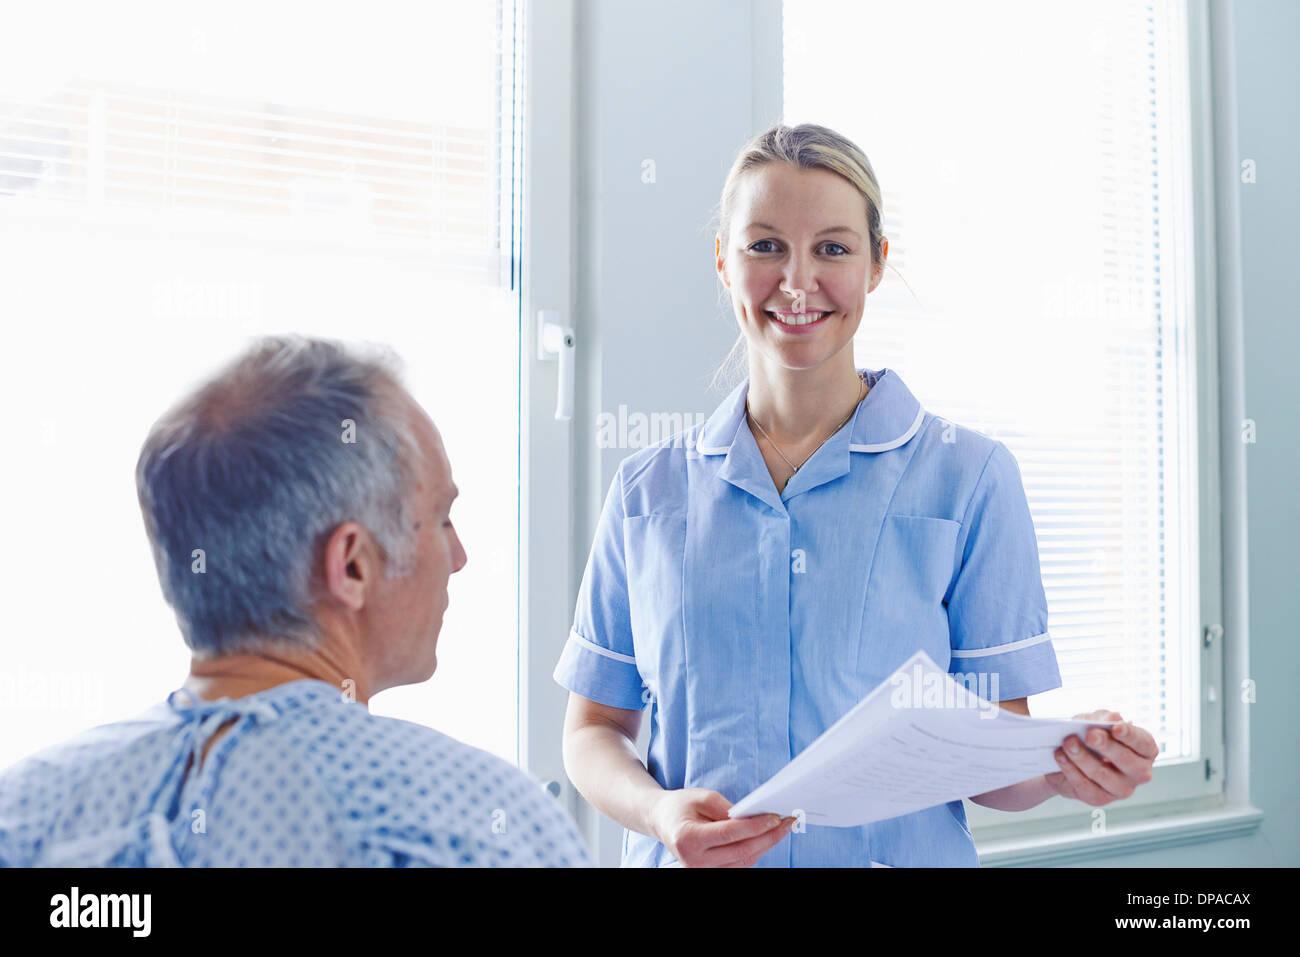 Nurse having conversation with patient - Stock Image